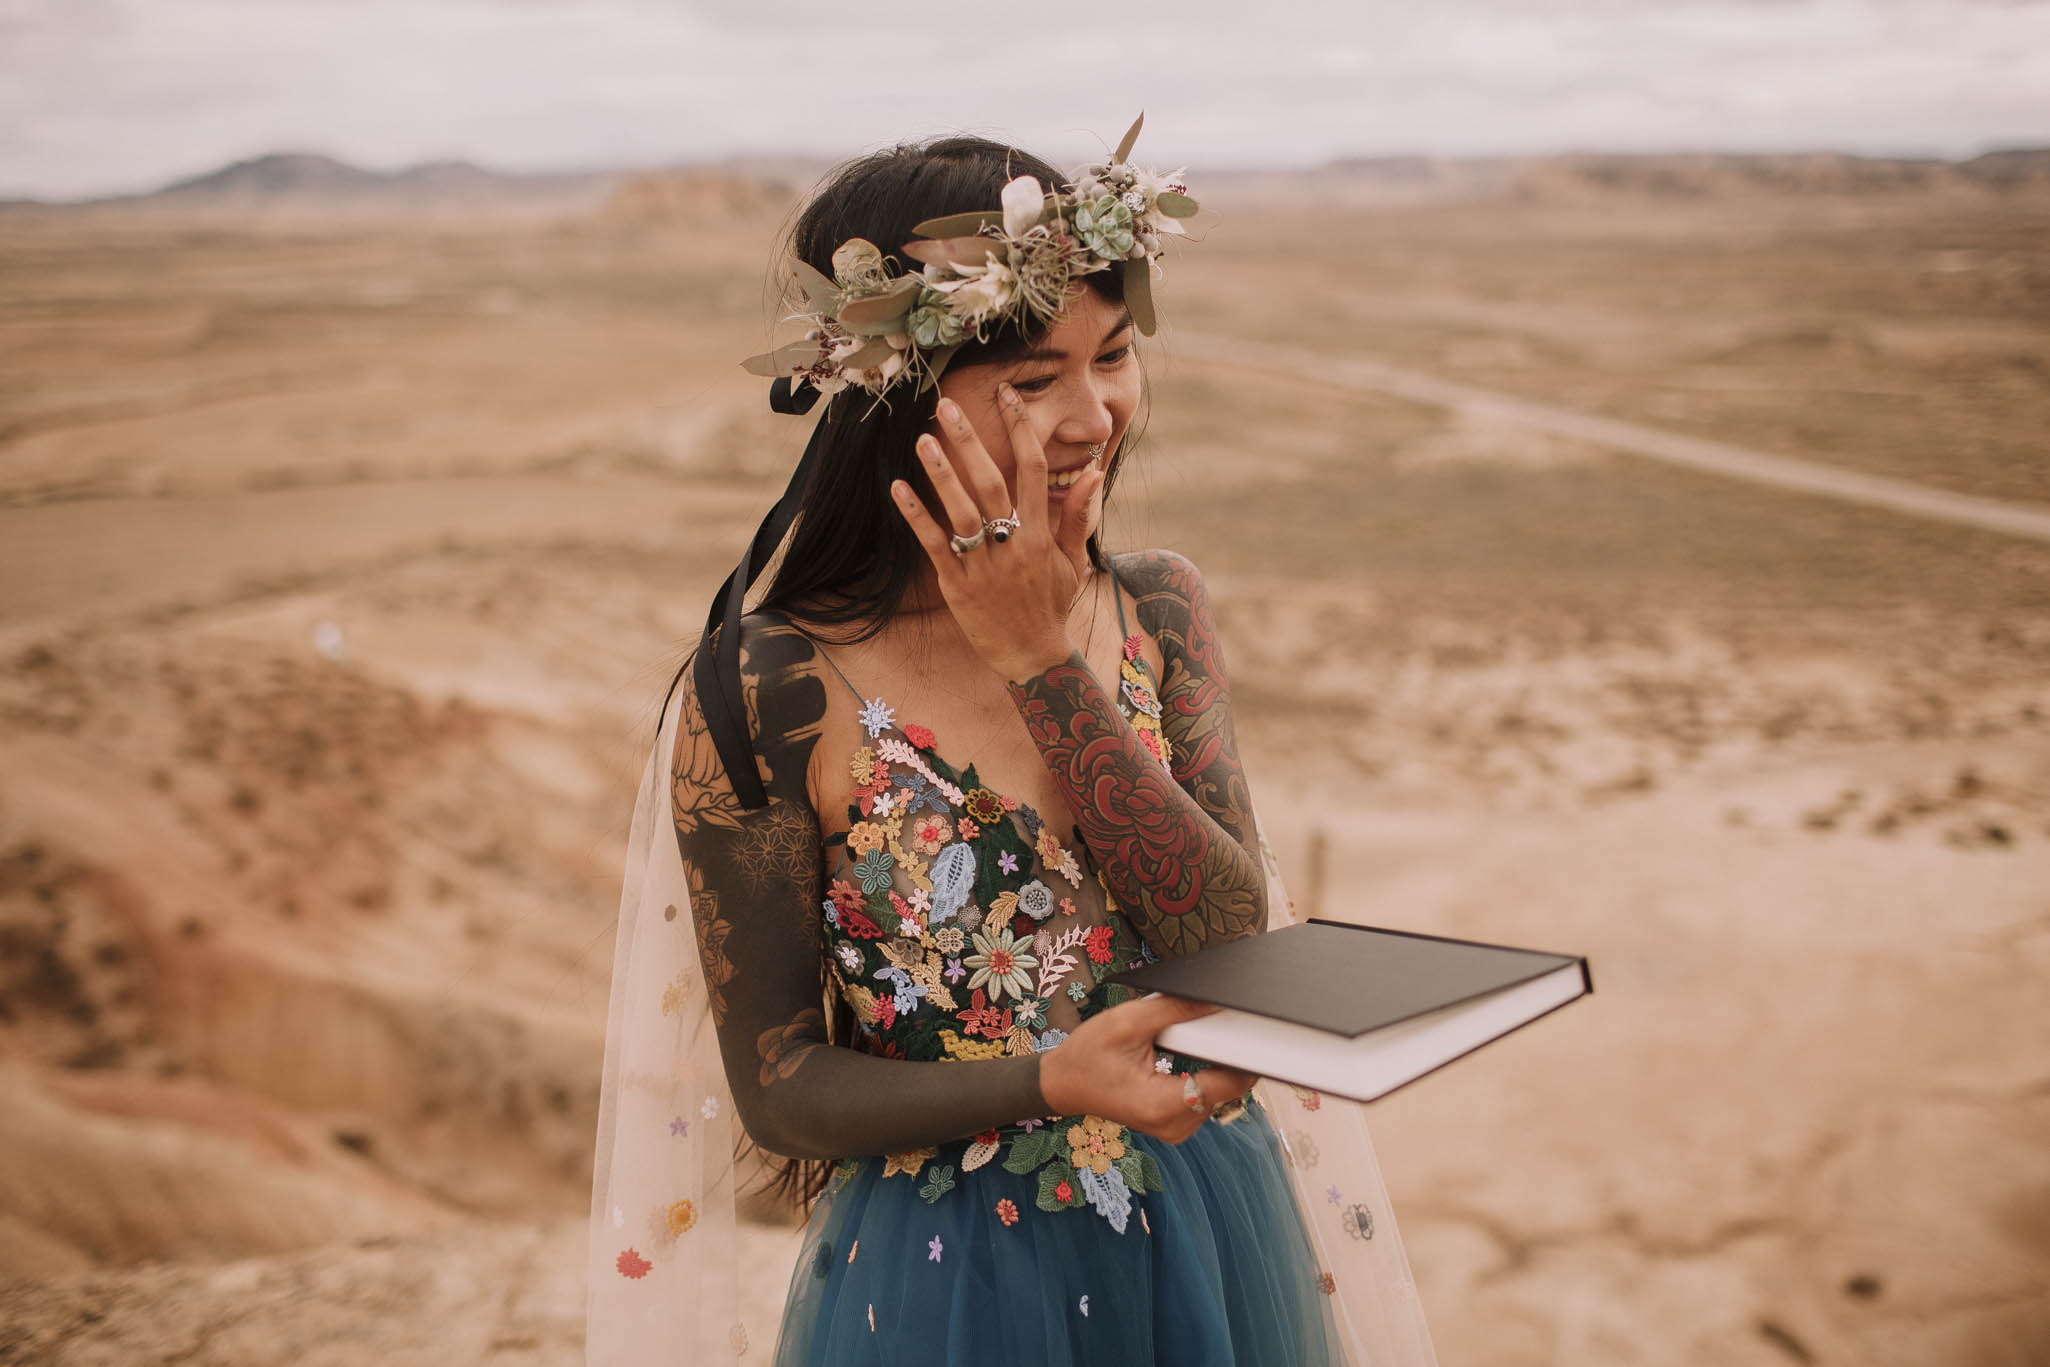 Spain-wedding-photographer-bardenas-reales-jeremy-boyer-photographe-mariage-bordeaux-floral-wedding-dress-robe-98.jpg